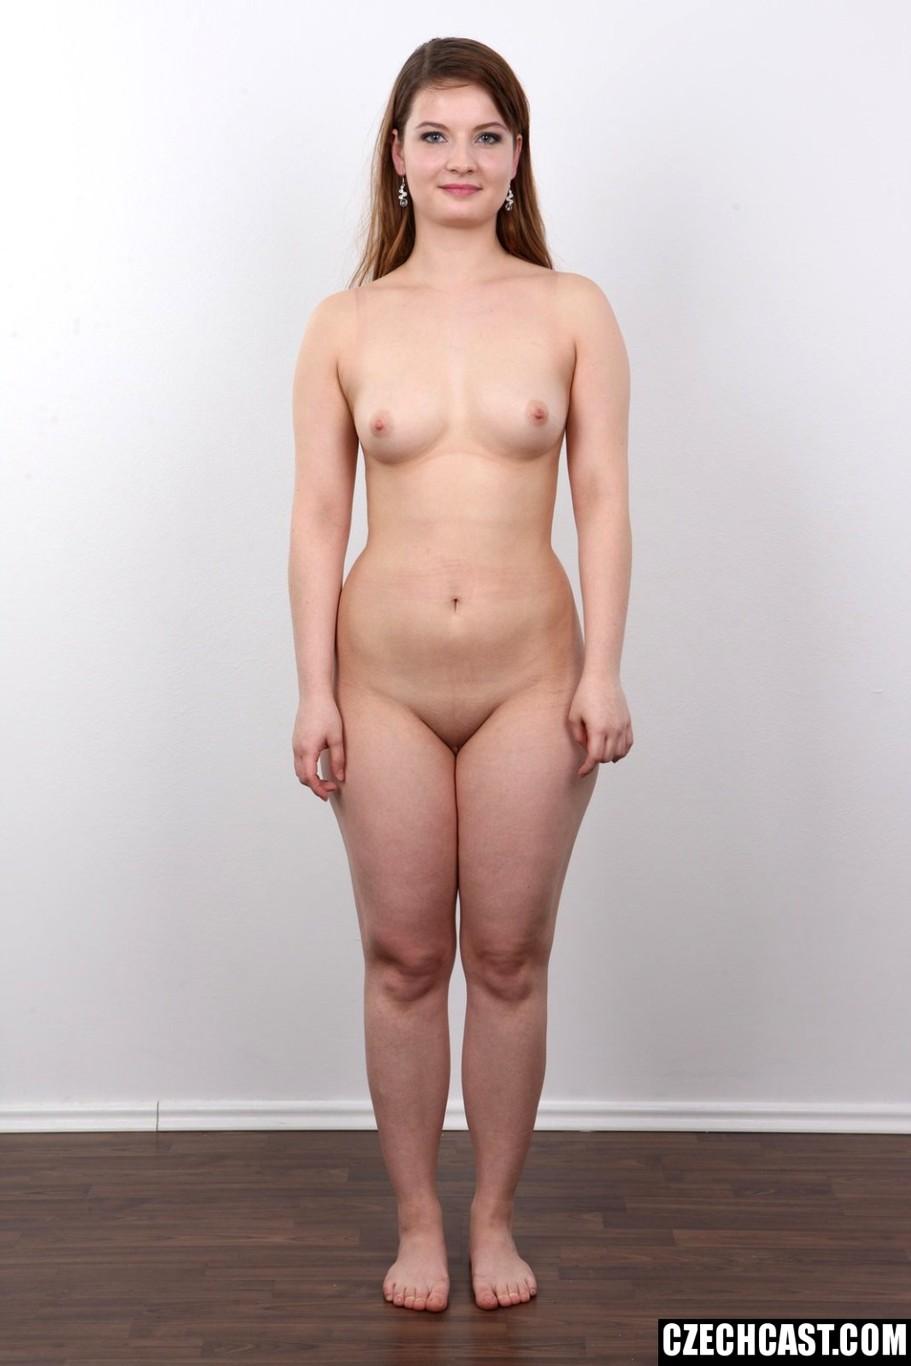 Female Porn Casting